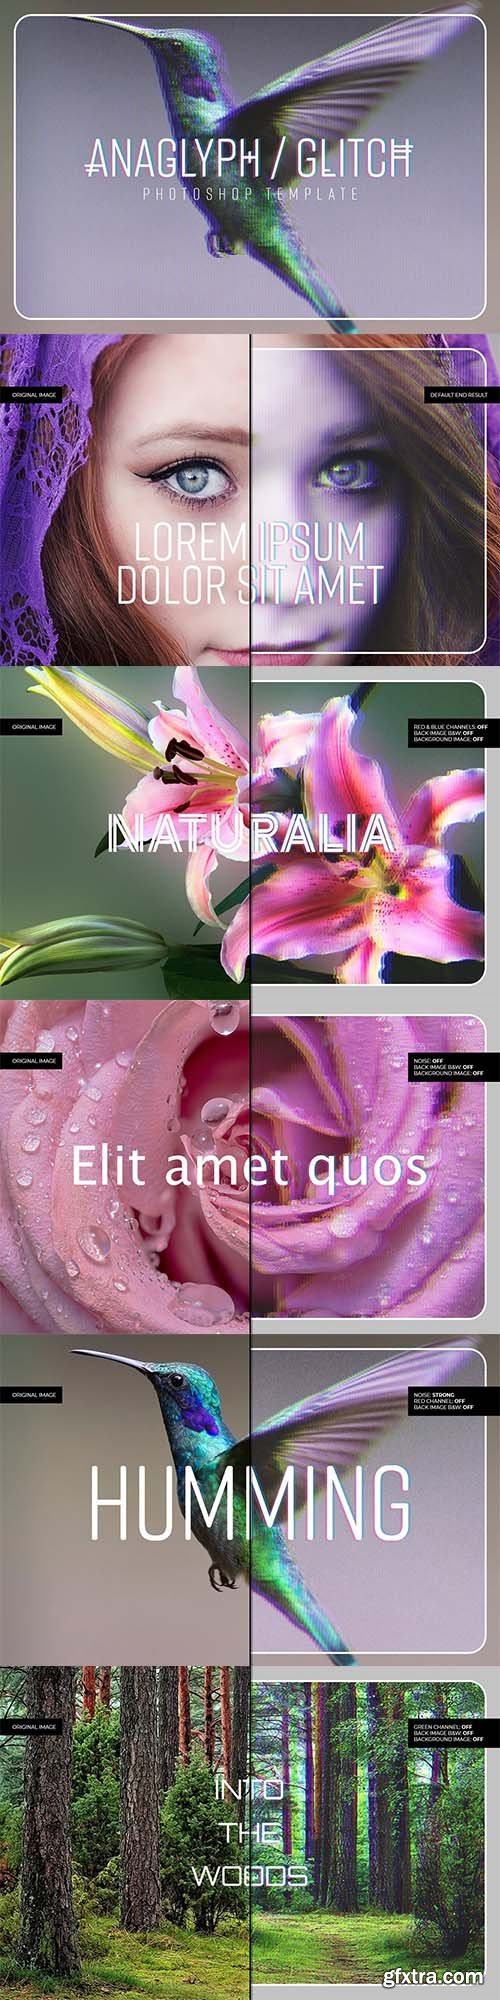 CreativeMarket - Anaglyph/Glitch Photoshop Template 5794468